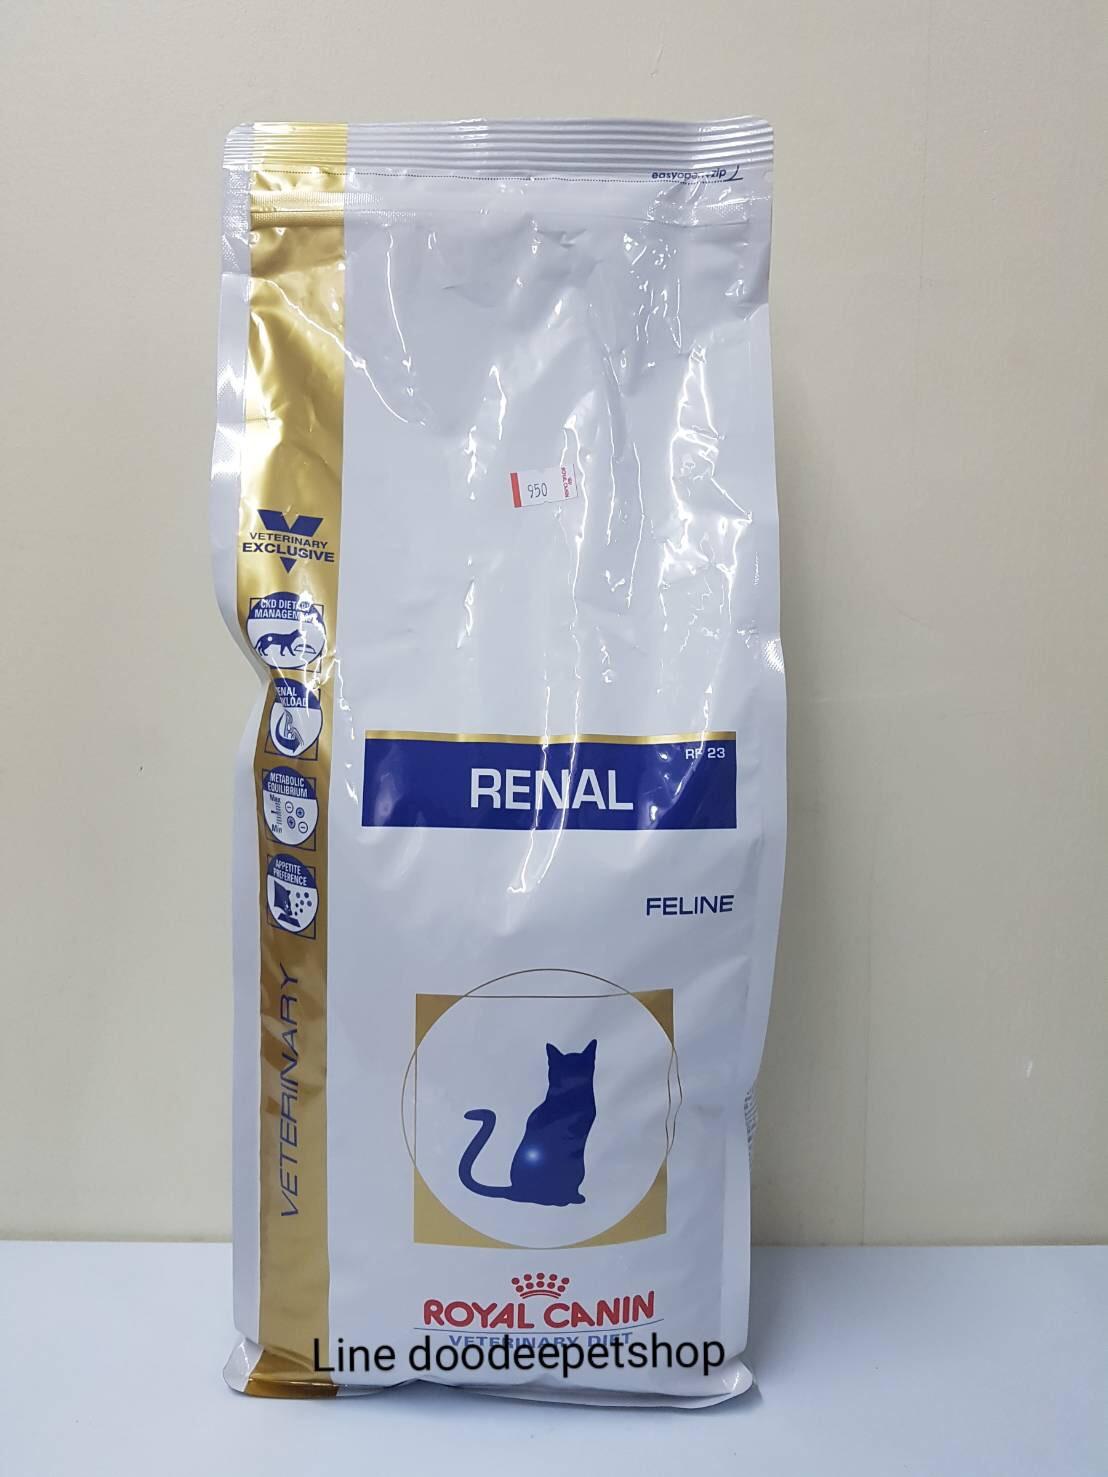 Renal 2 kg. Exp.08/19 แมวโรคไต